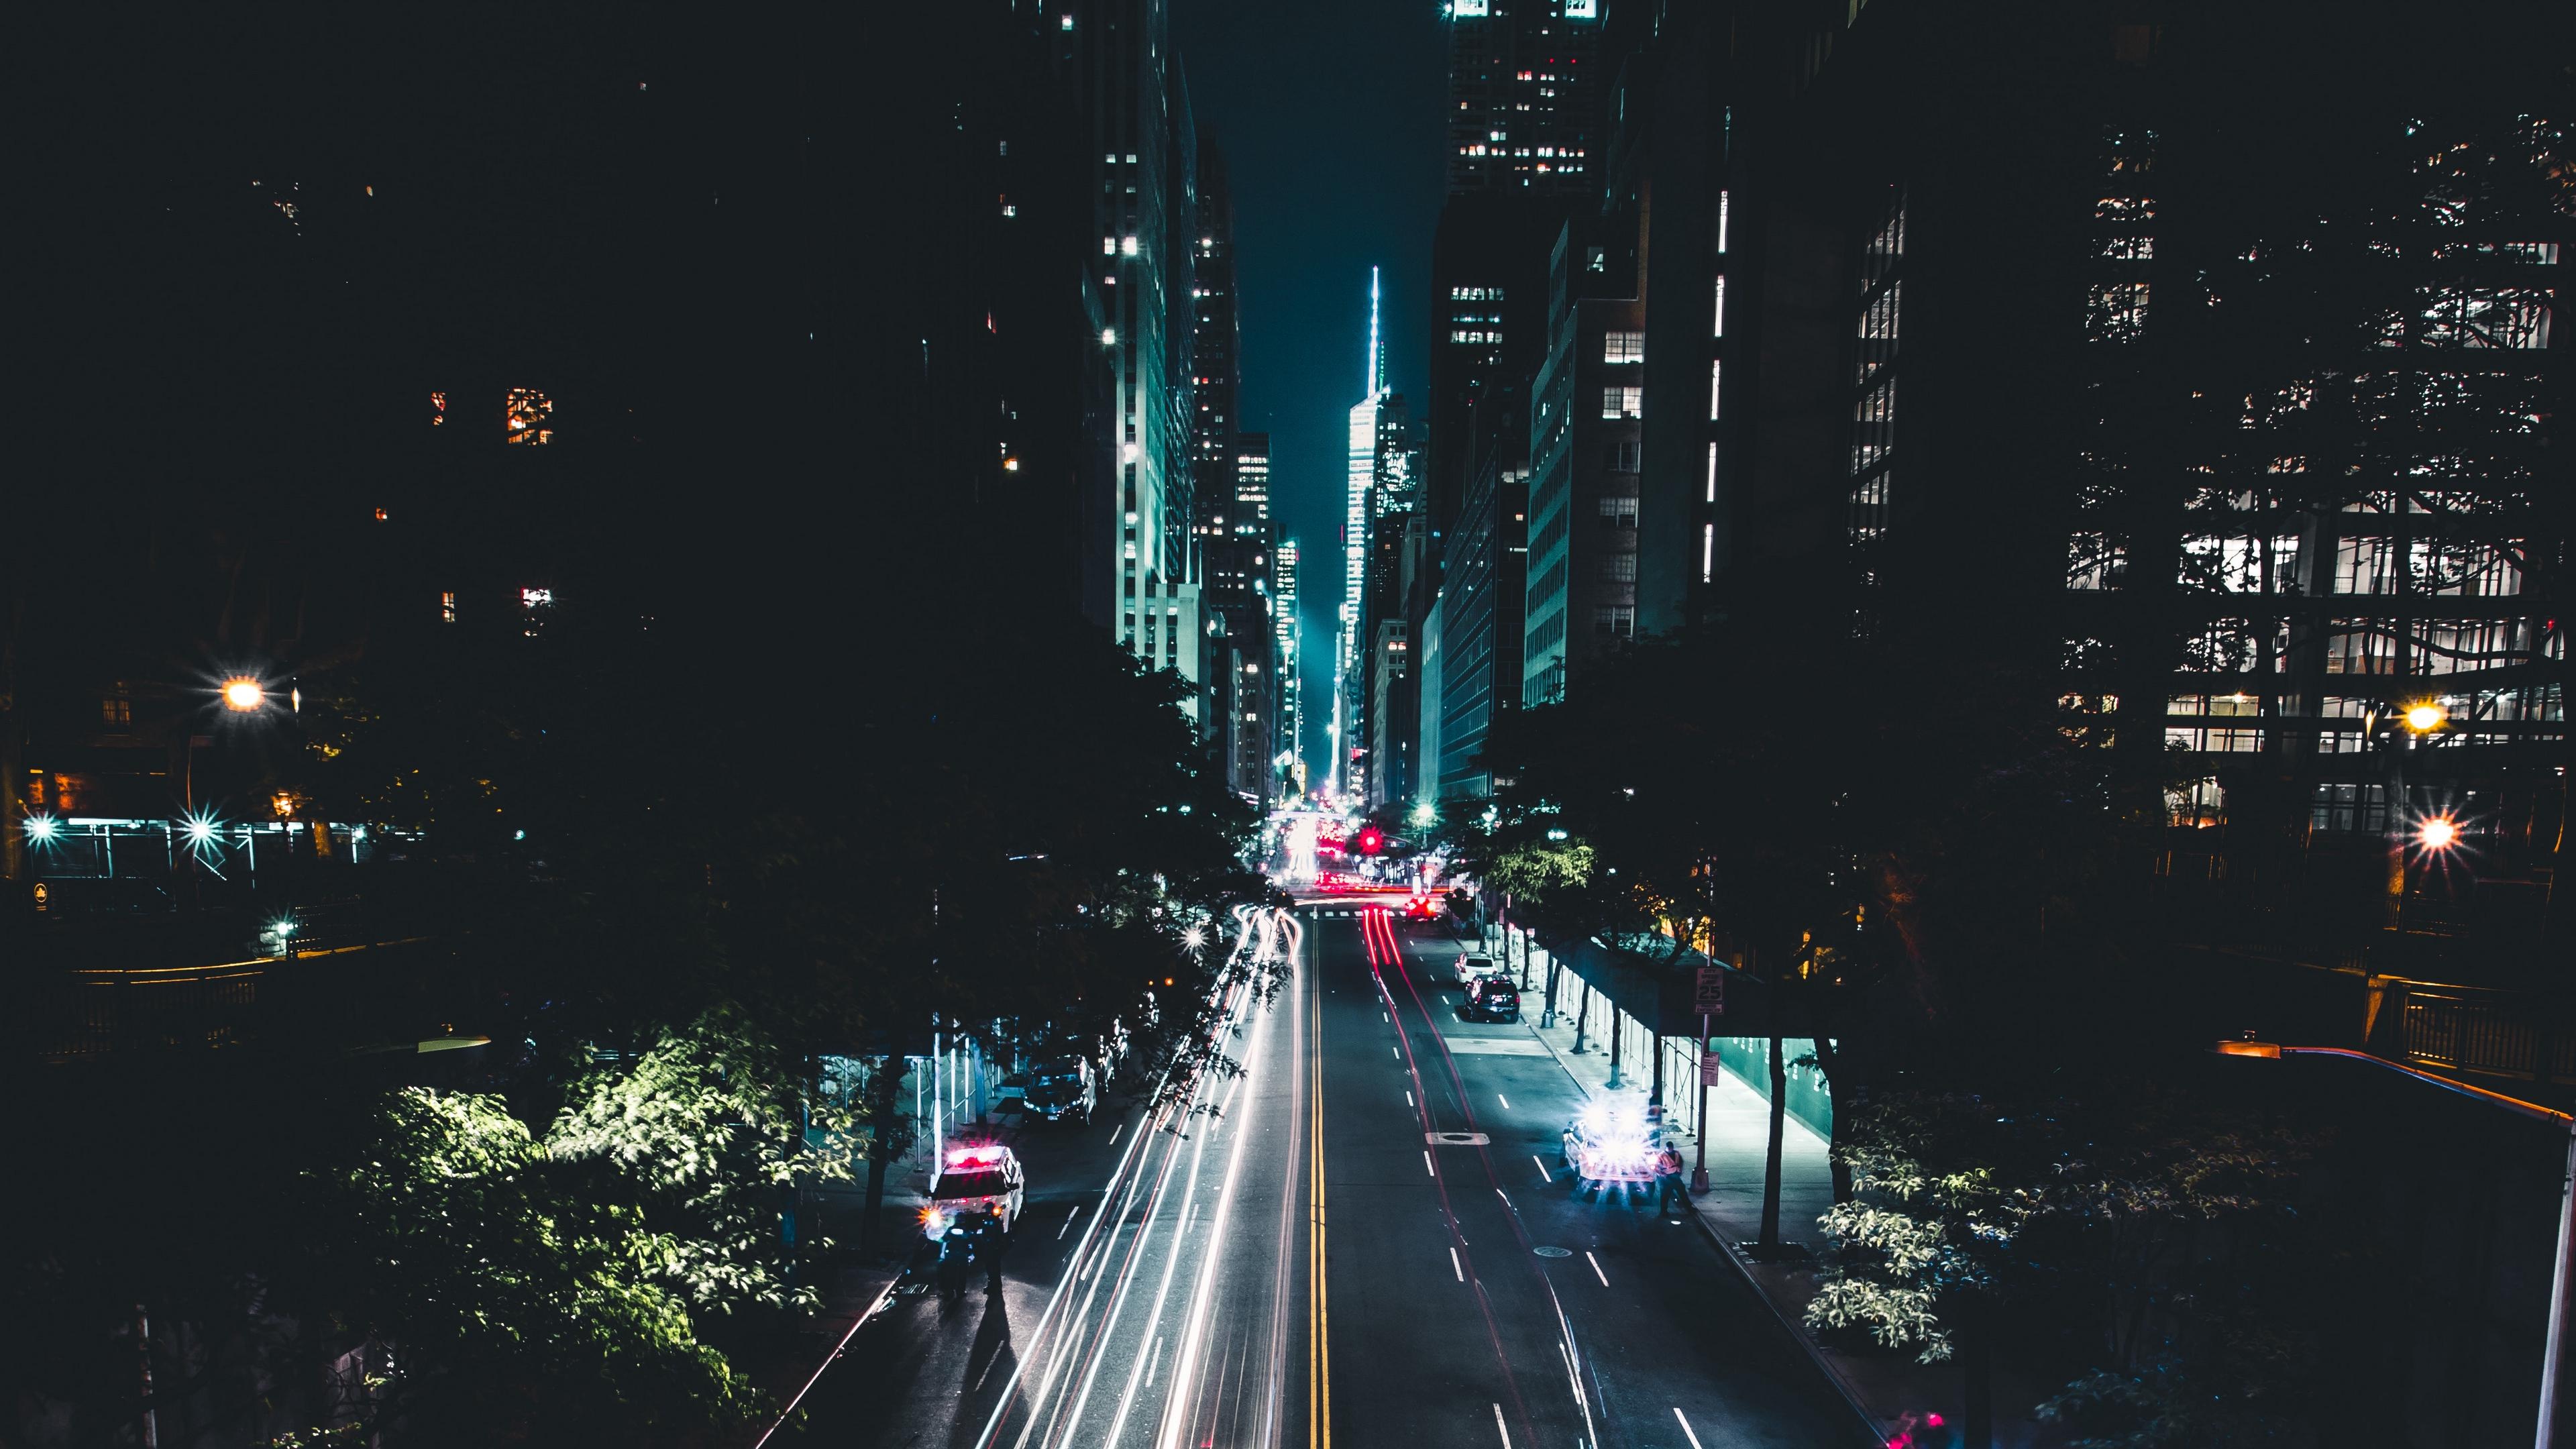 night city road traffic cars marking new york usa 4k 1538066305 - night city, road, traffic, cars, marking, new york, usa 4k - Traffic, Road, night city